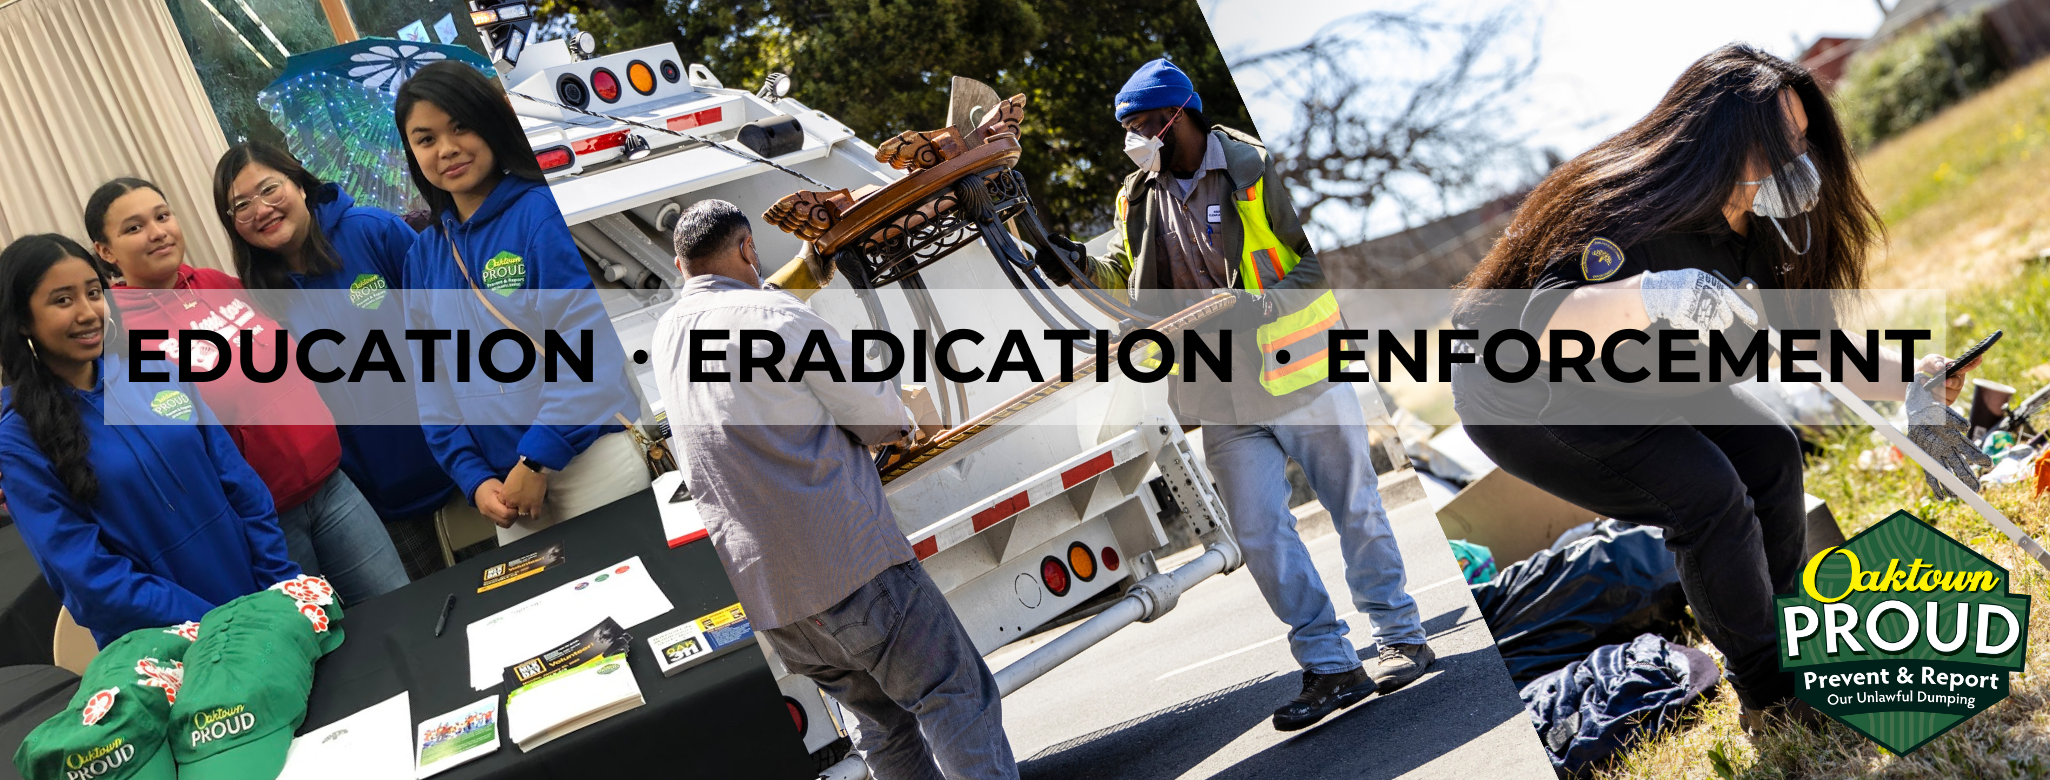 The Three E's: Education, Eradication, Enforcement